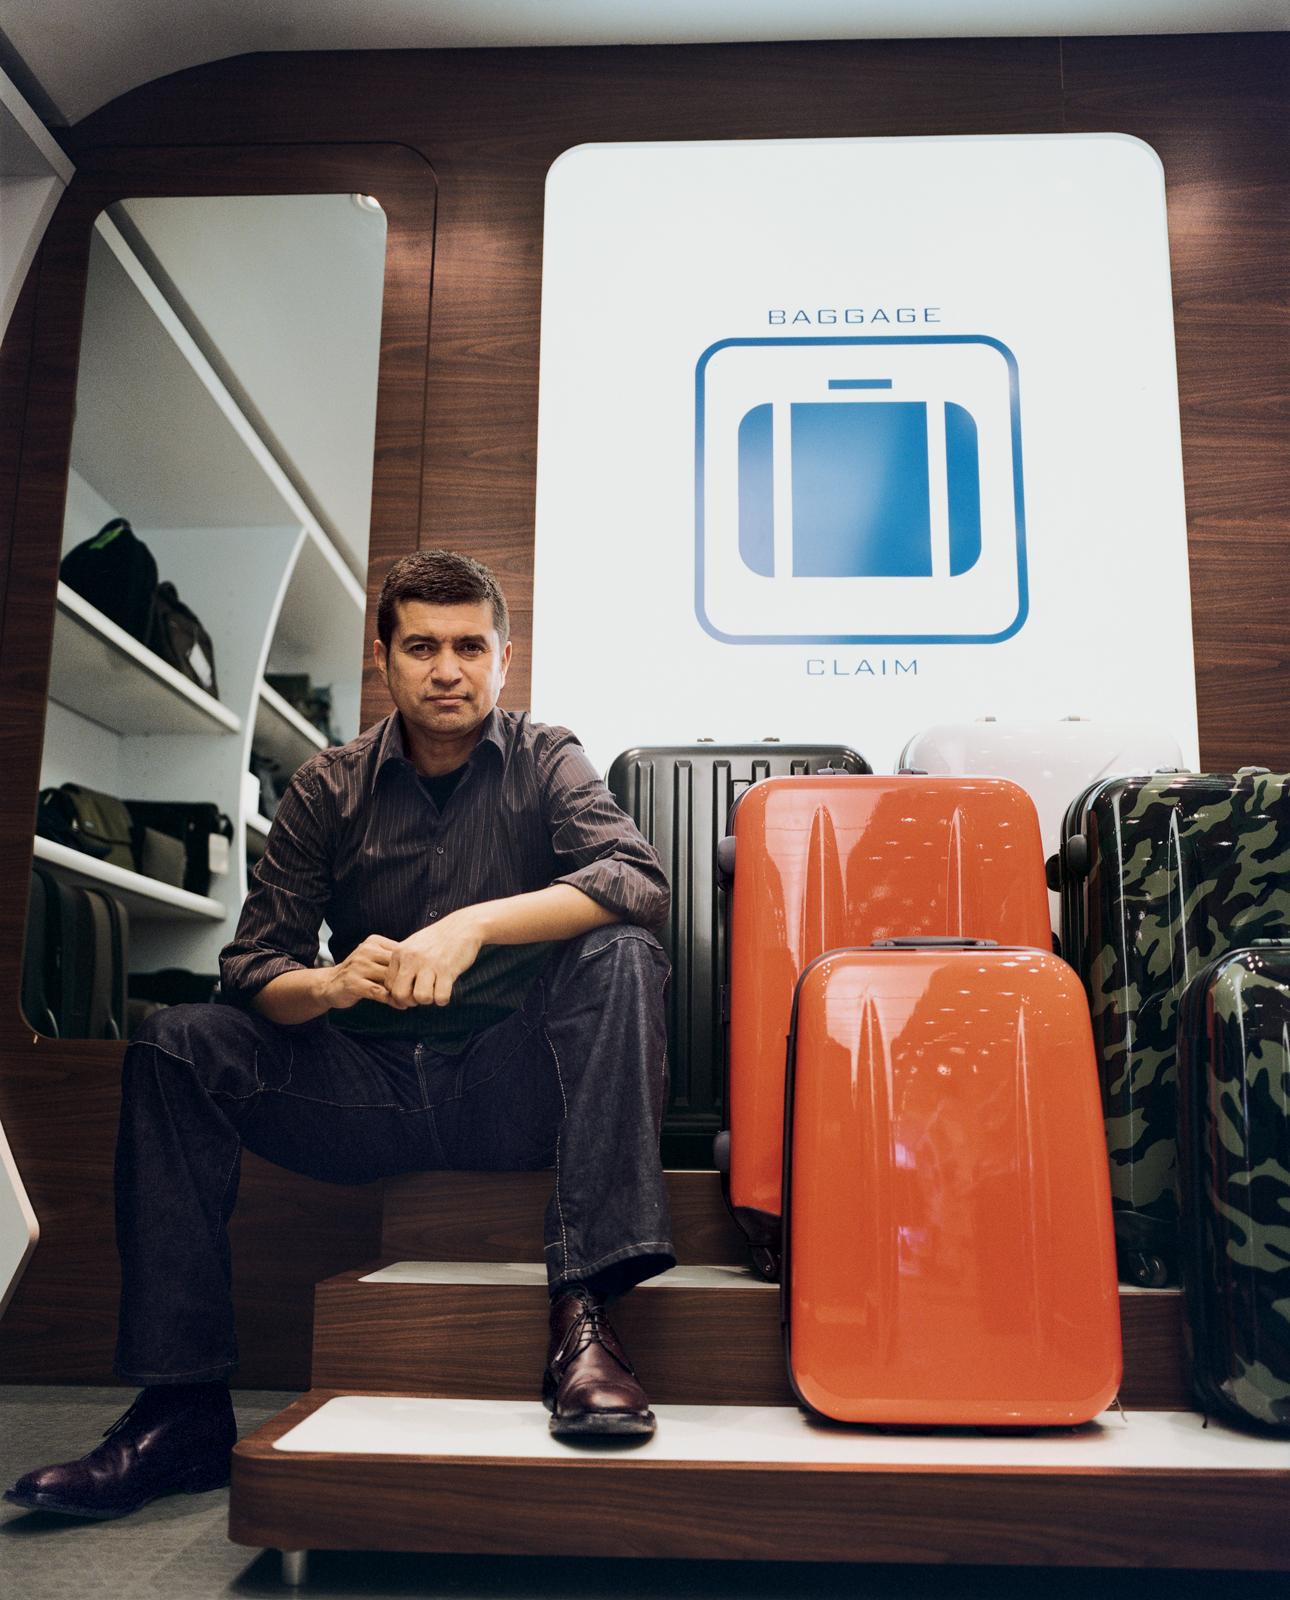 carry on bags expert flight 001 sencion John